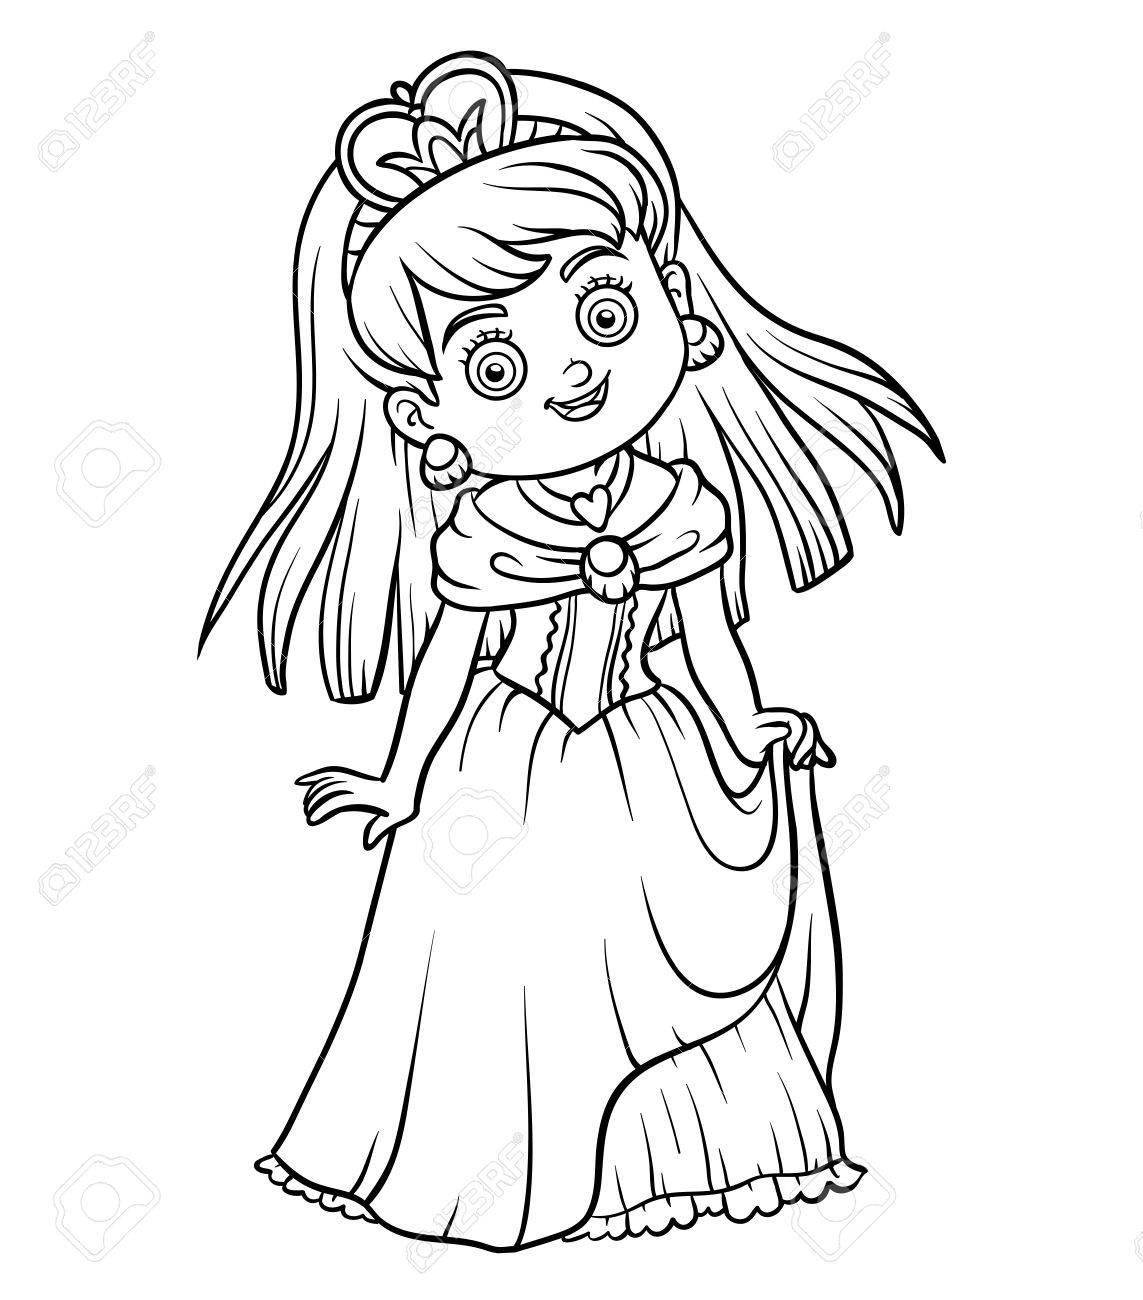 Dibujo Para Colorear Para Niños Personaje De Dibujos Animados Princesa